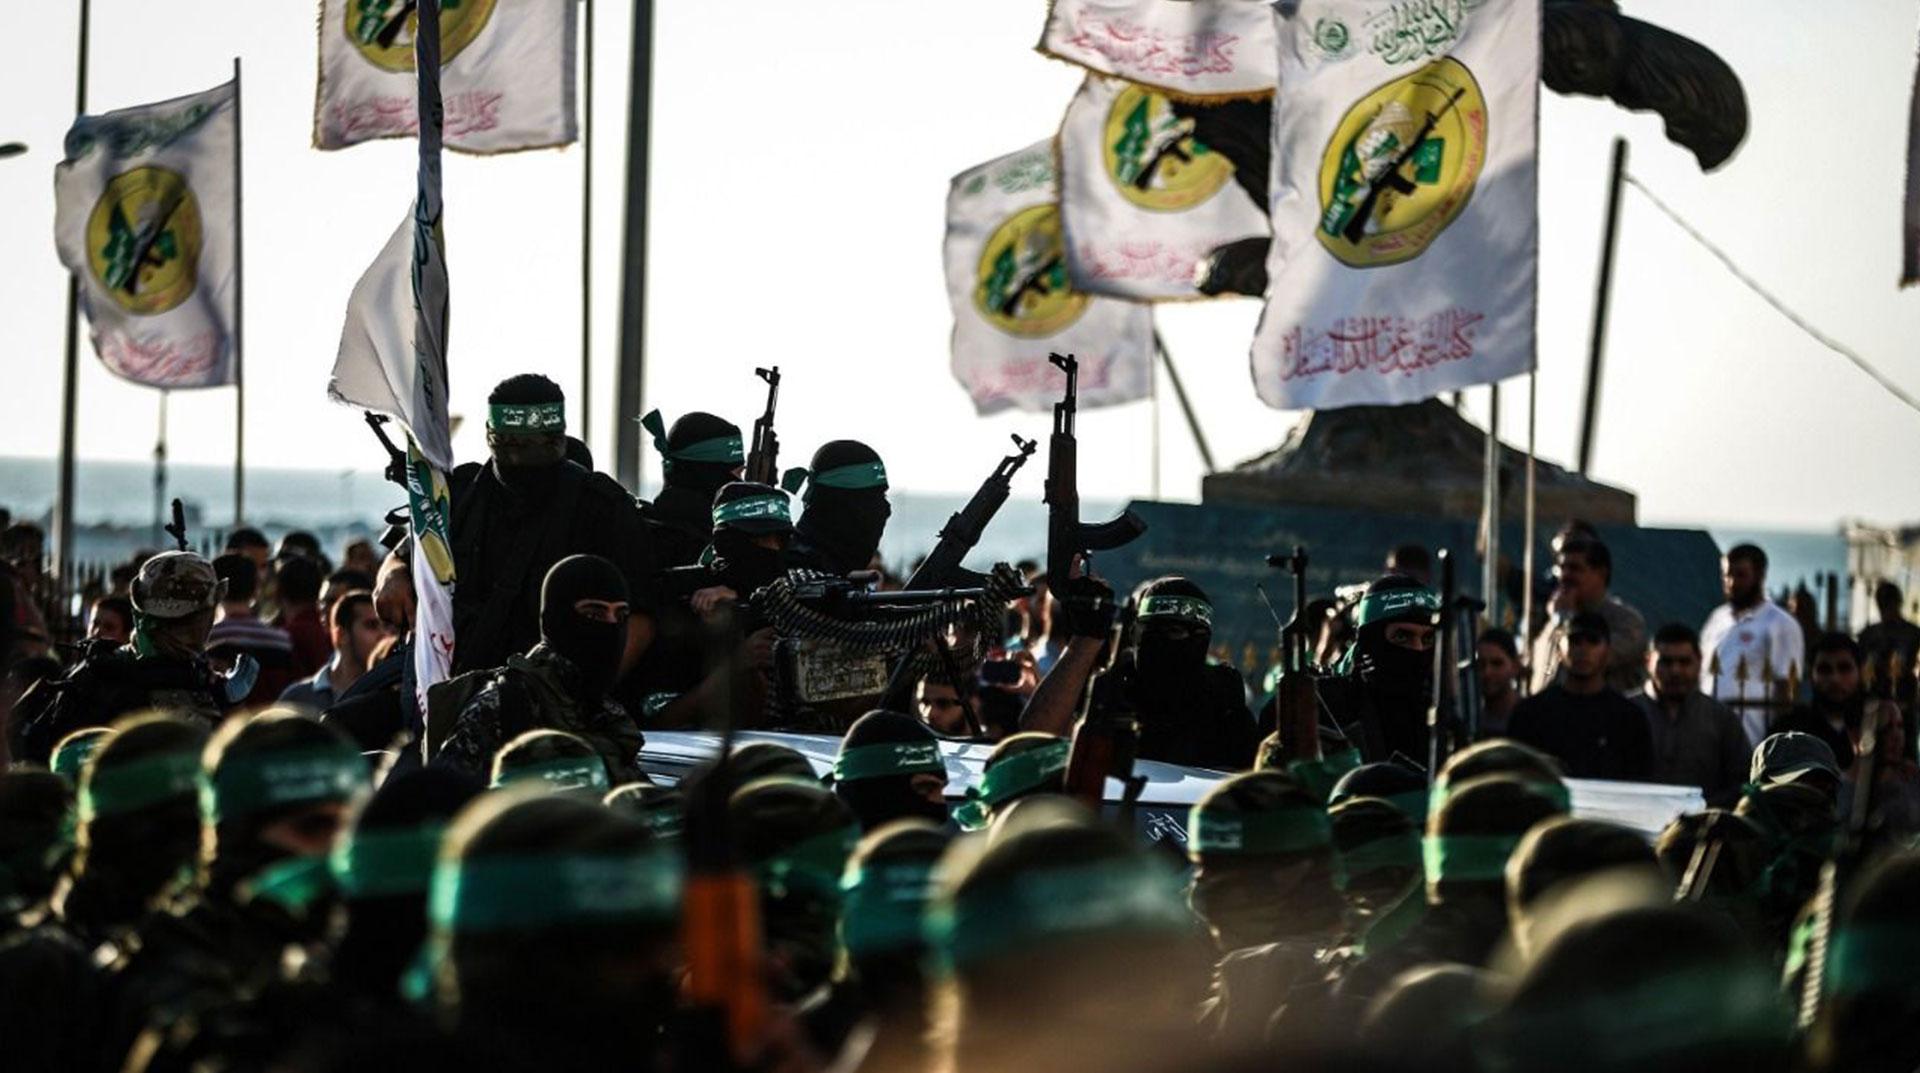 Hamas'tan İsrail'e net mesaj: Pek çok seçenek var